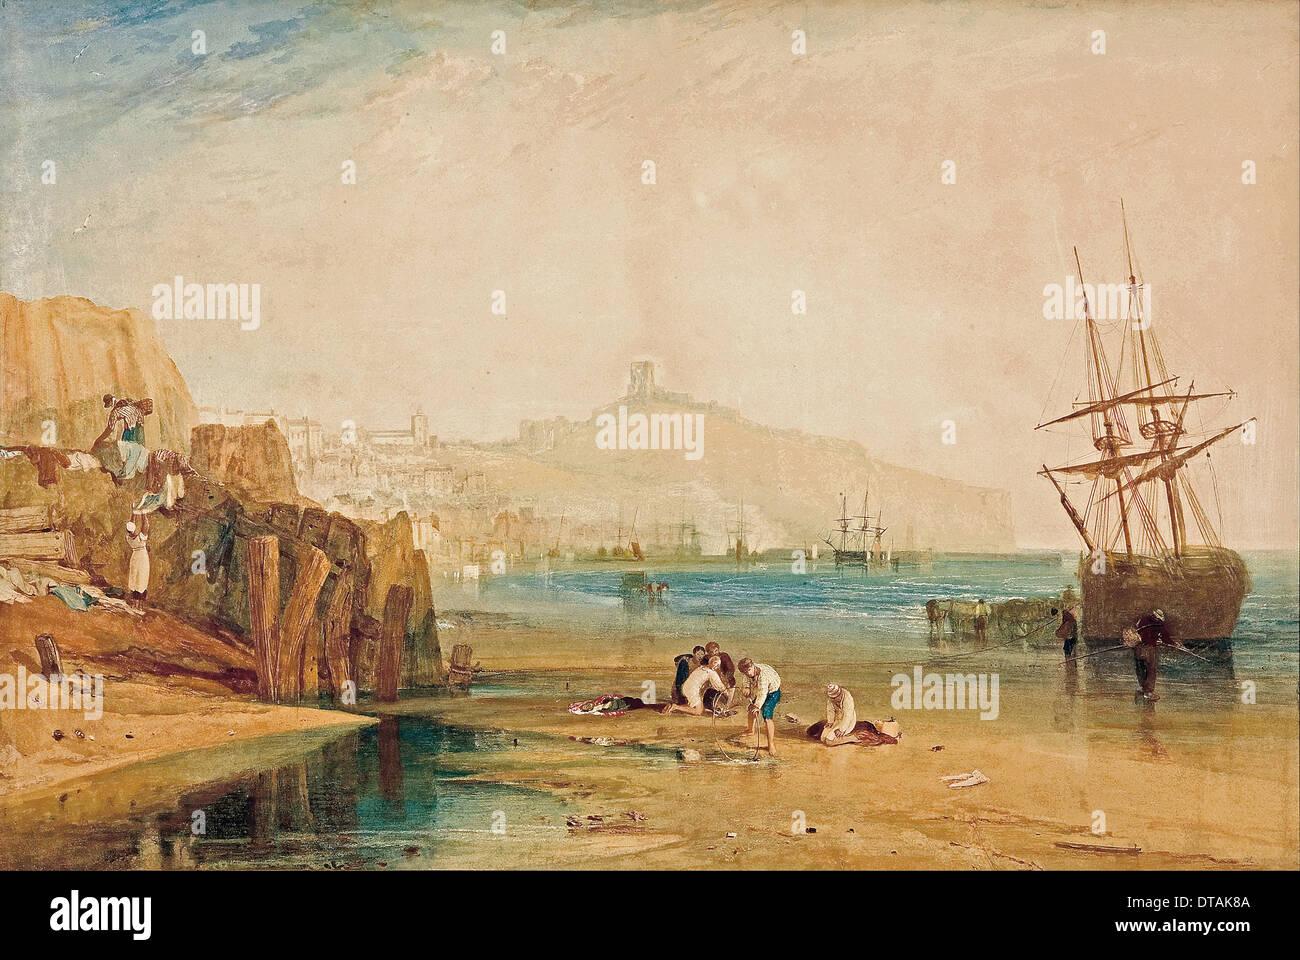 Scarborough, morning, boys catching crabs, c. 1810. Artist: Turner,